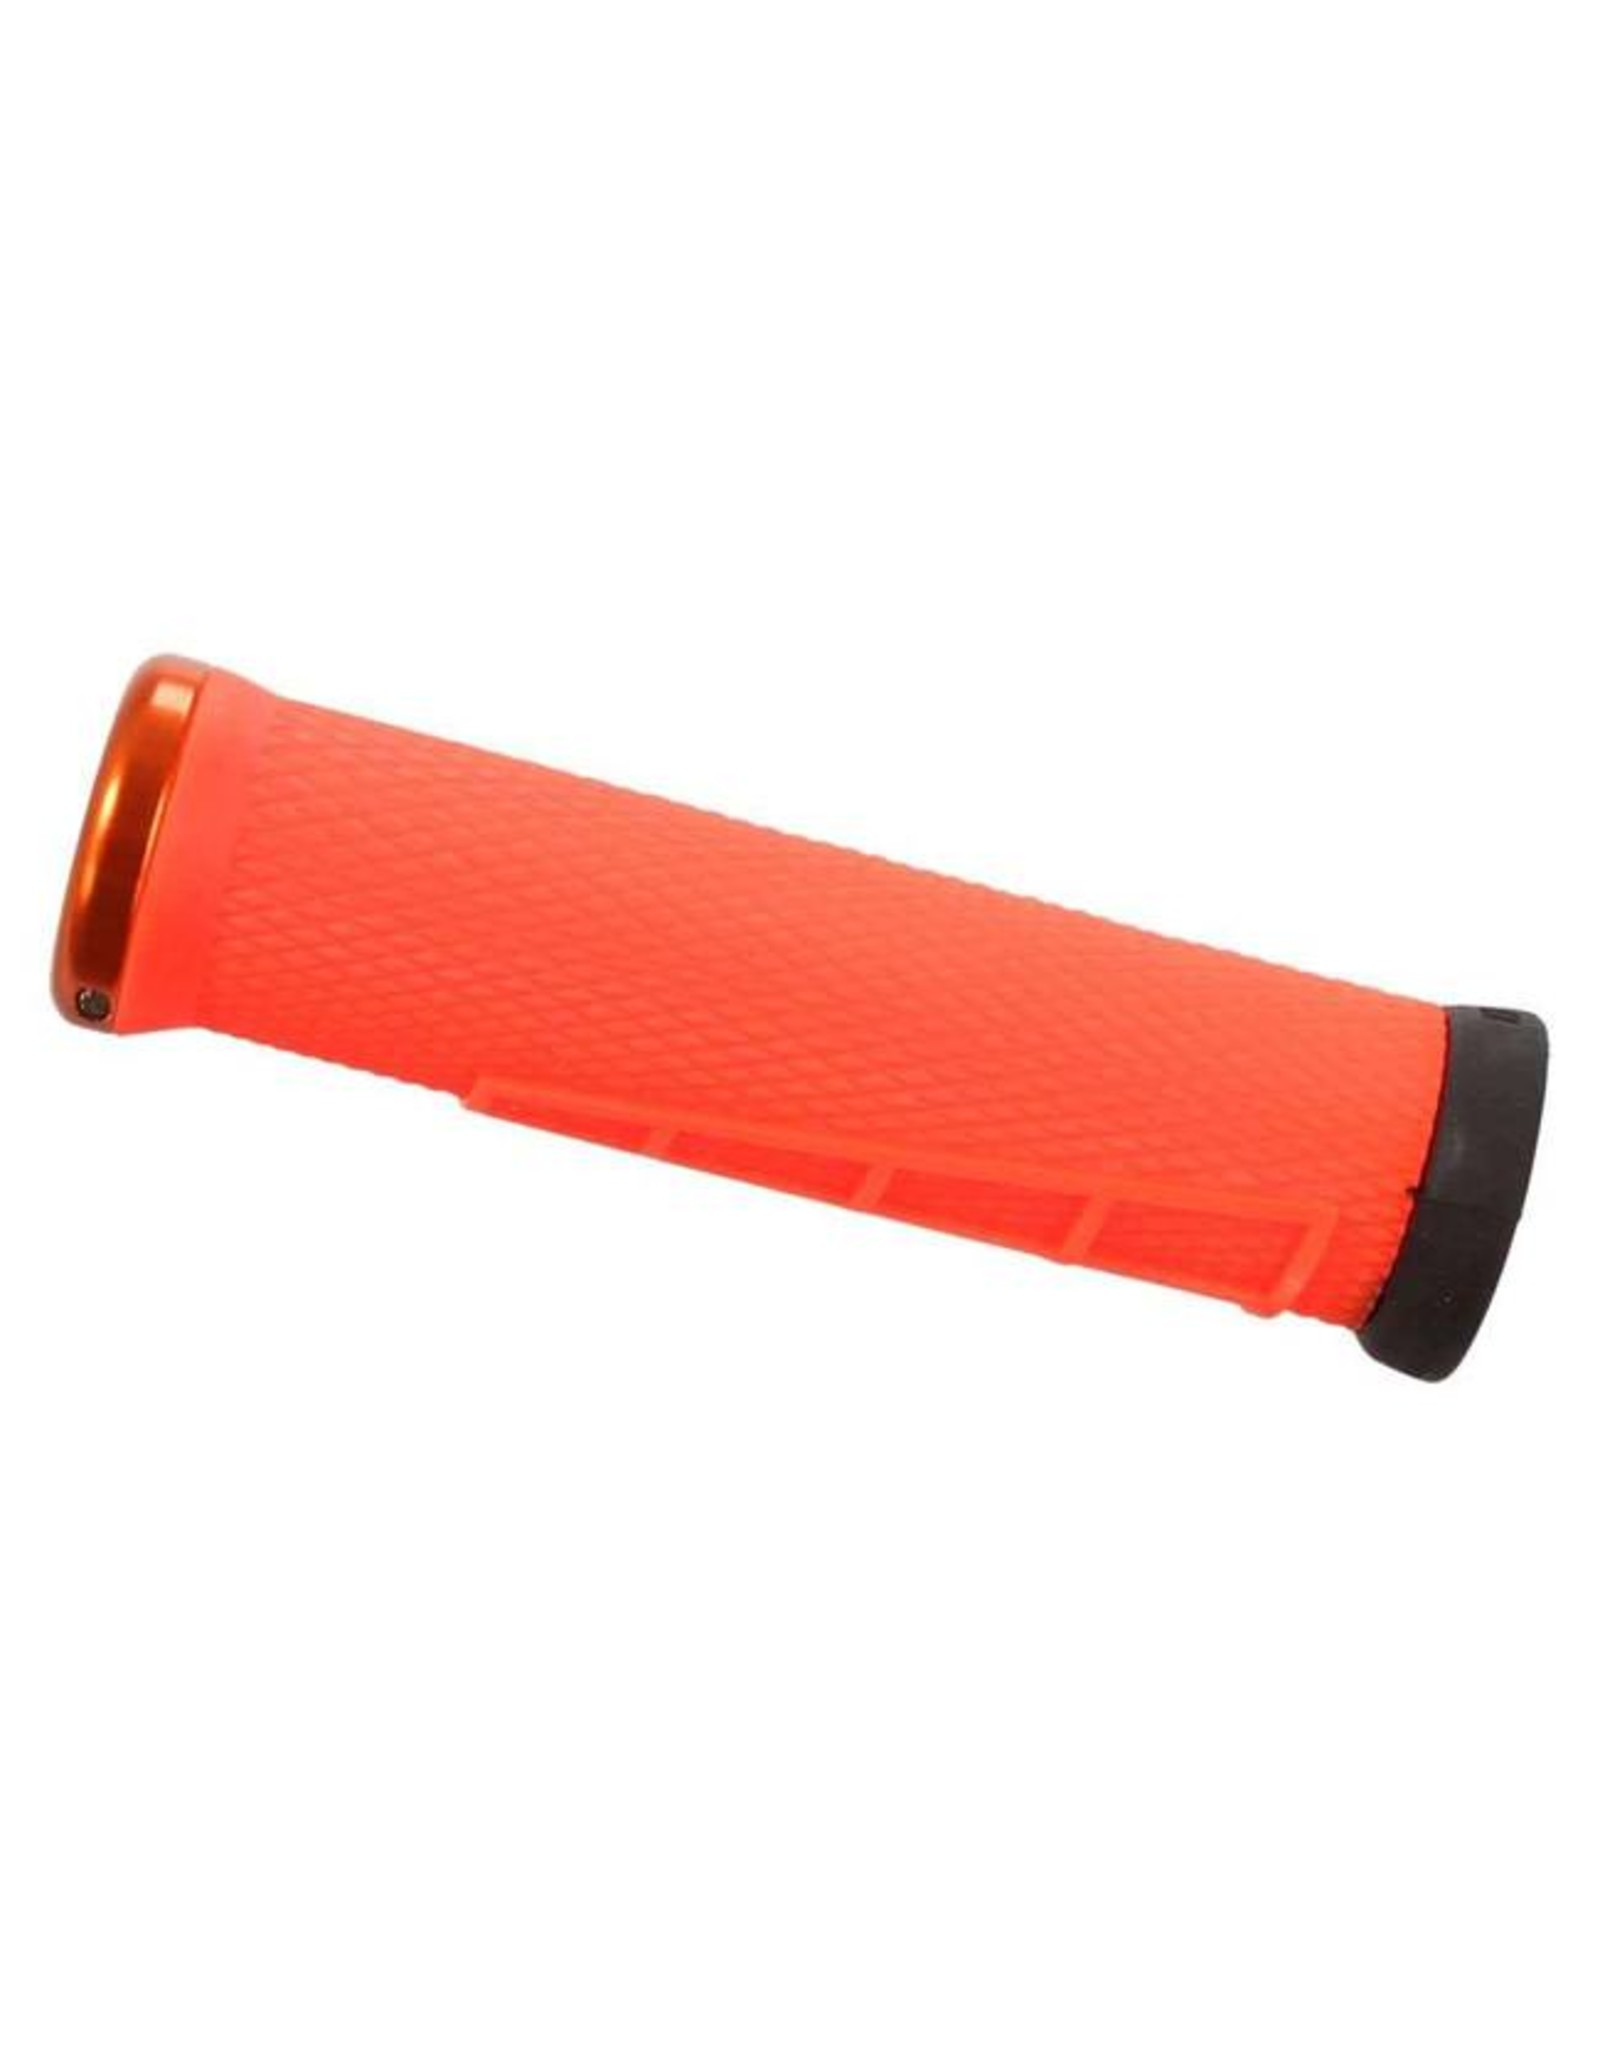 ODI ODI Elite Flow Lock-On Grips Orange with Orange Clamps